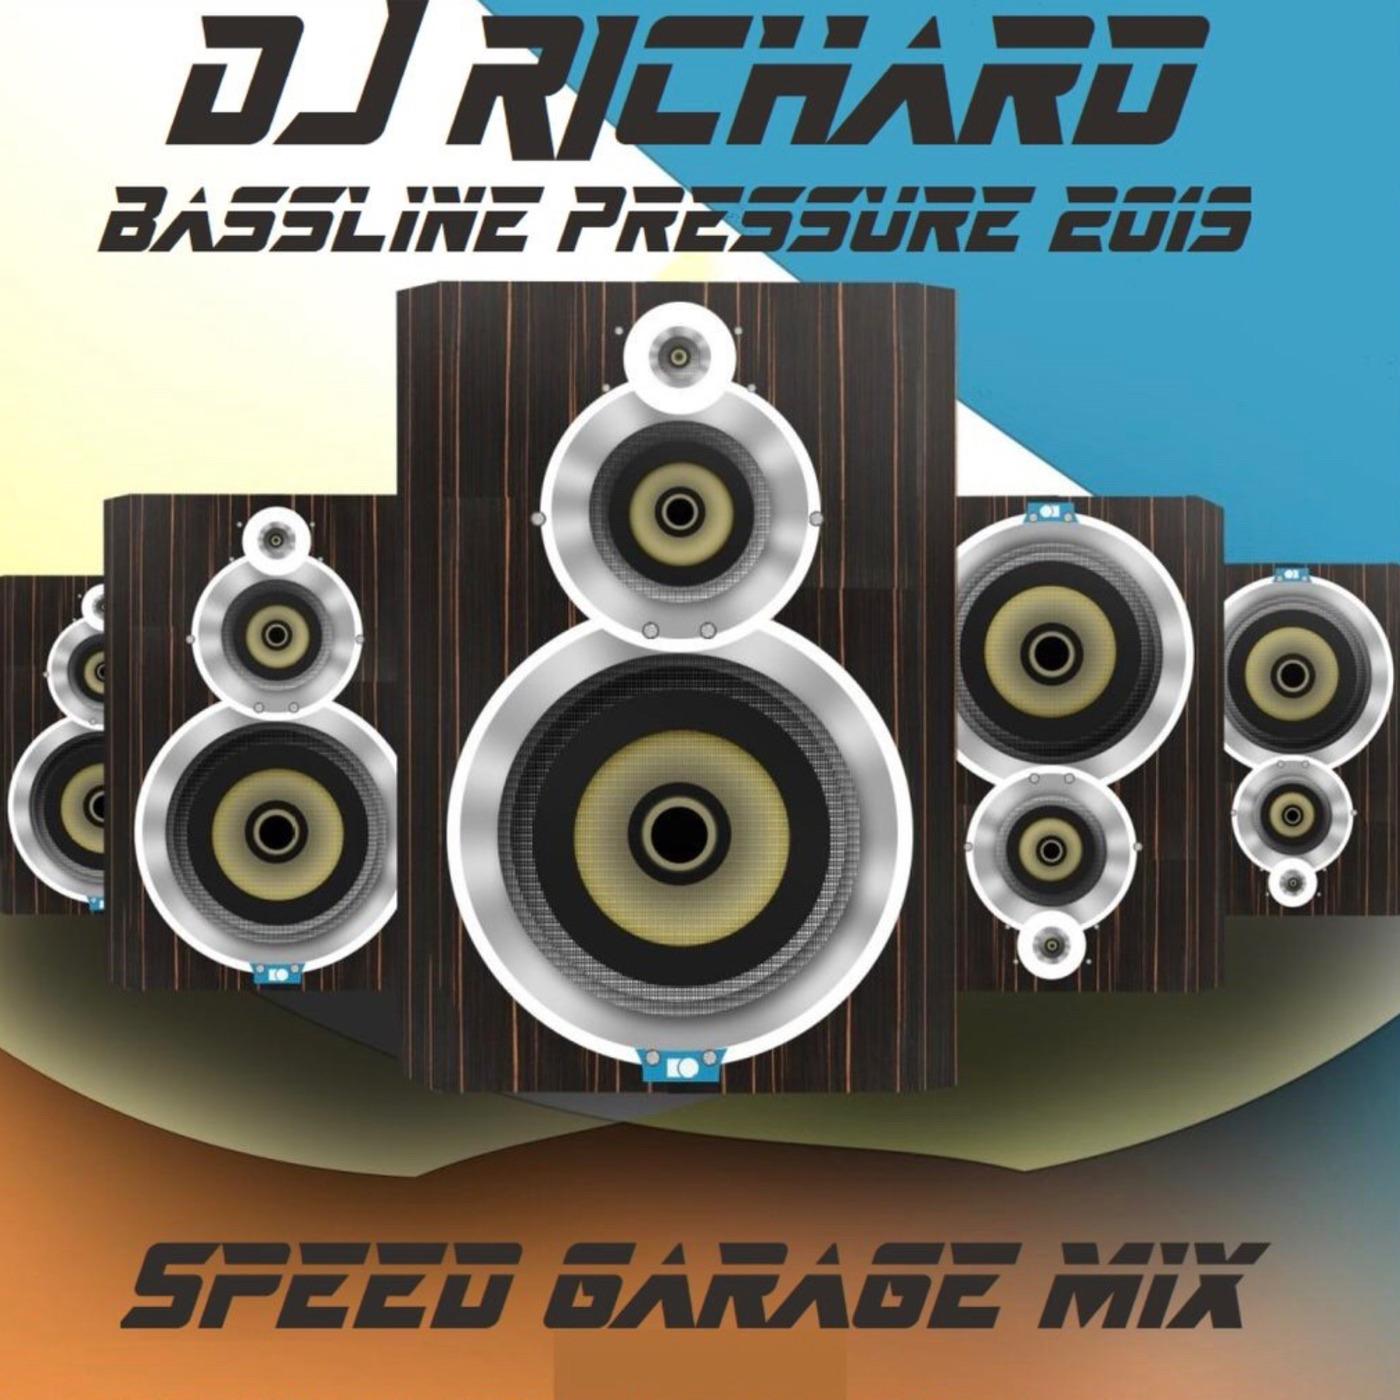 DJ Richard - Bassline Pressure 2019 - Vol 1 [Guest Mix